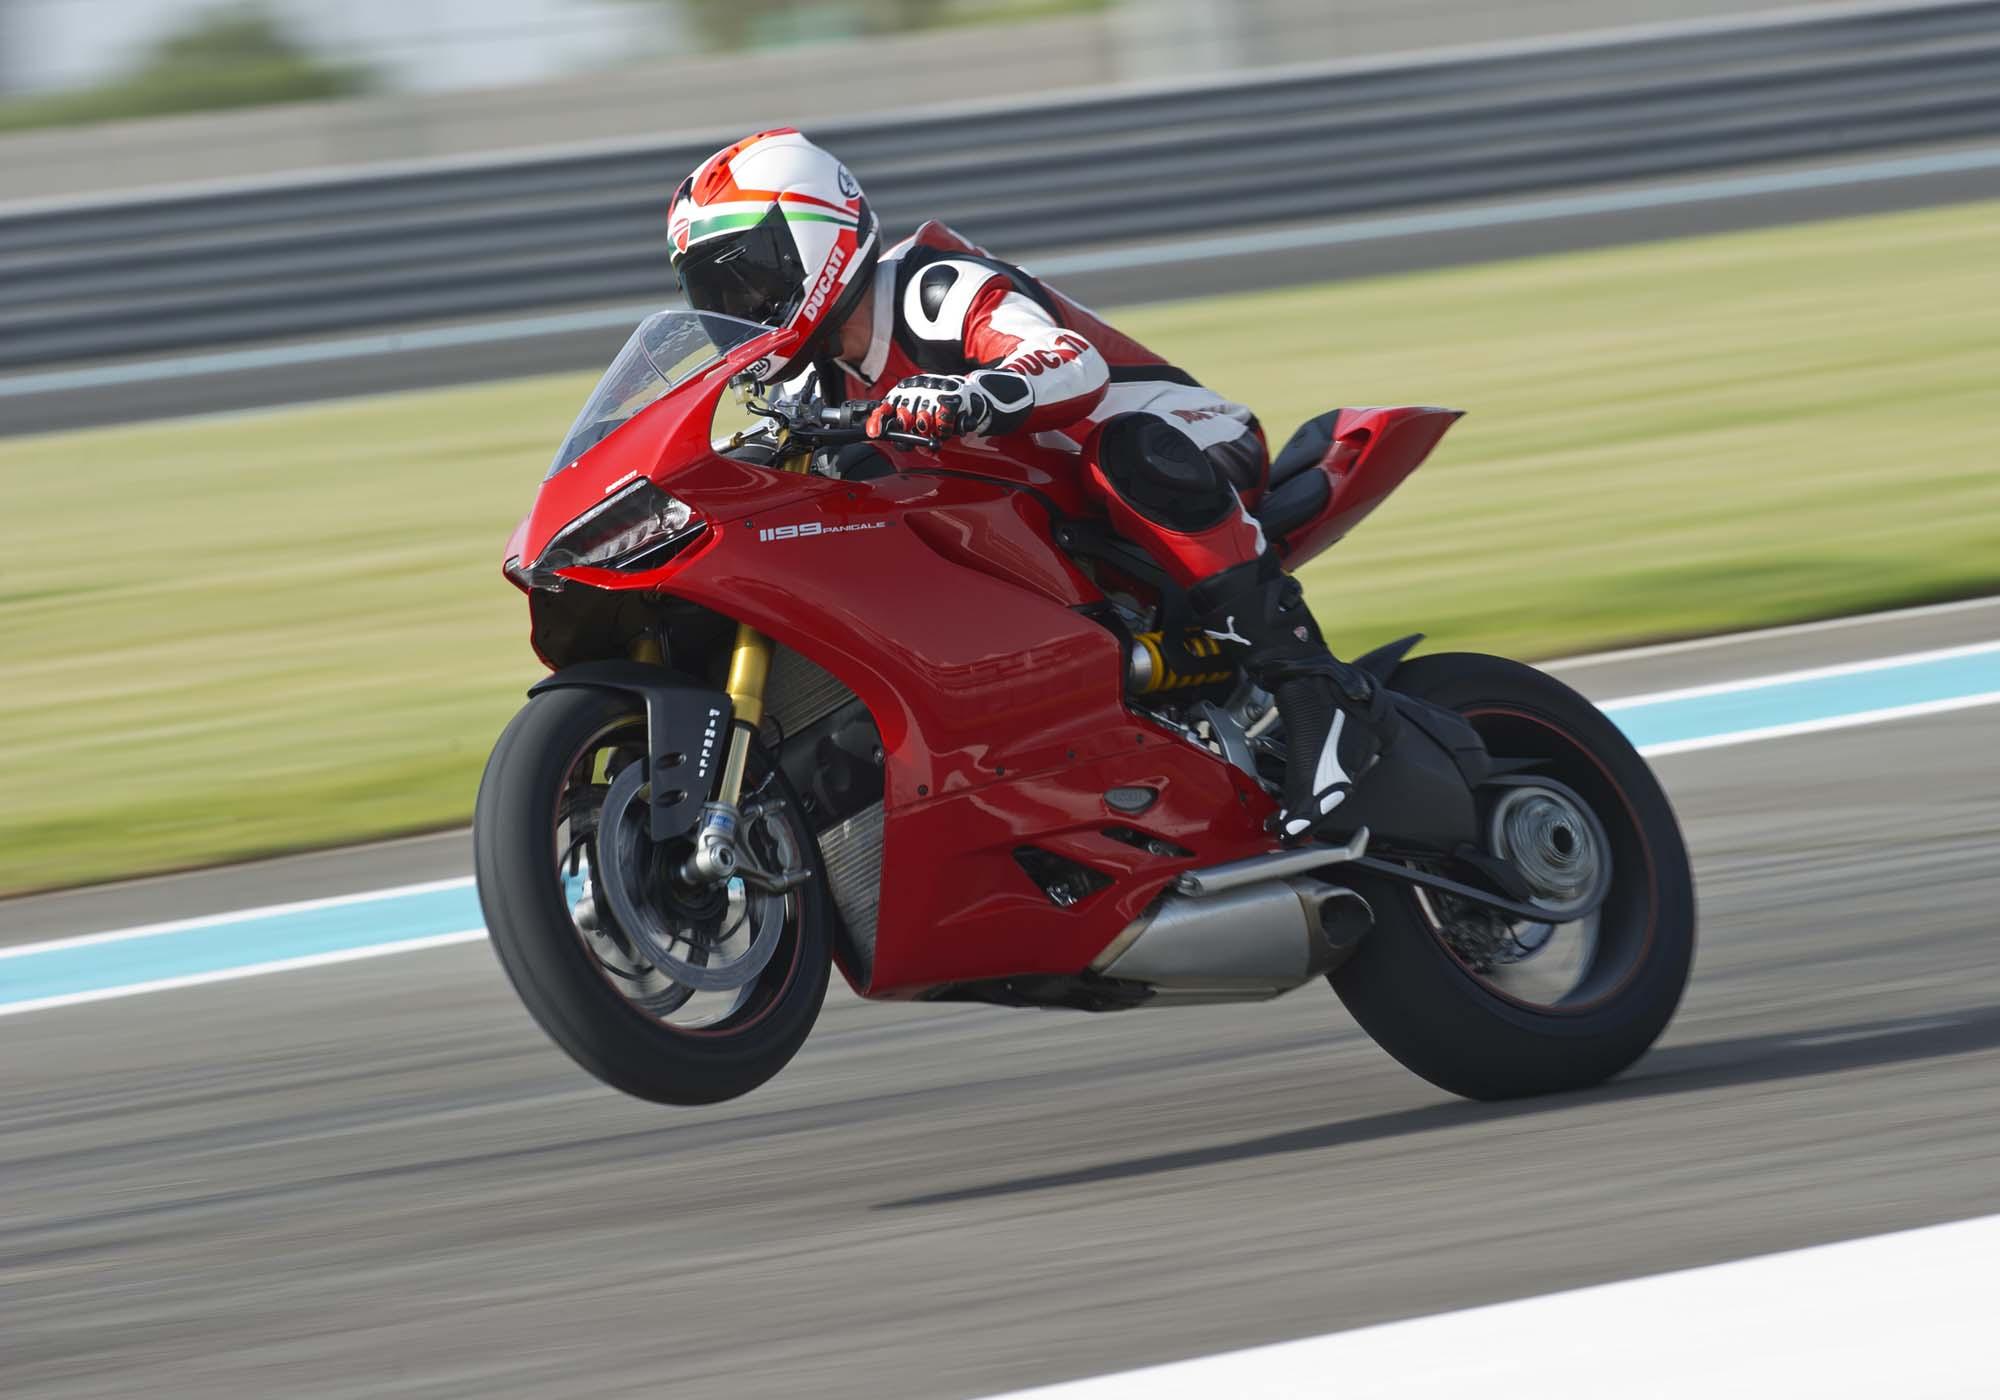 ultimate speed freaks(the Big boys) hayabussa/zx-14r,CBR,Gixxer,R1,R6,Ducatti, - 2012 Ducati 1199 Panigale S Yas Marina Circuit 01